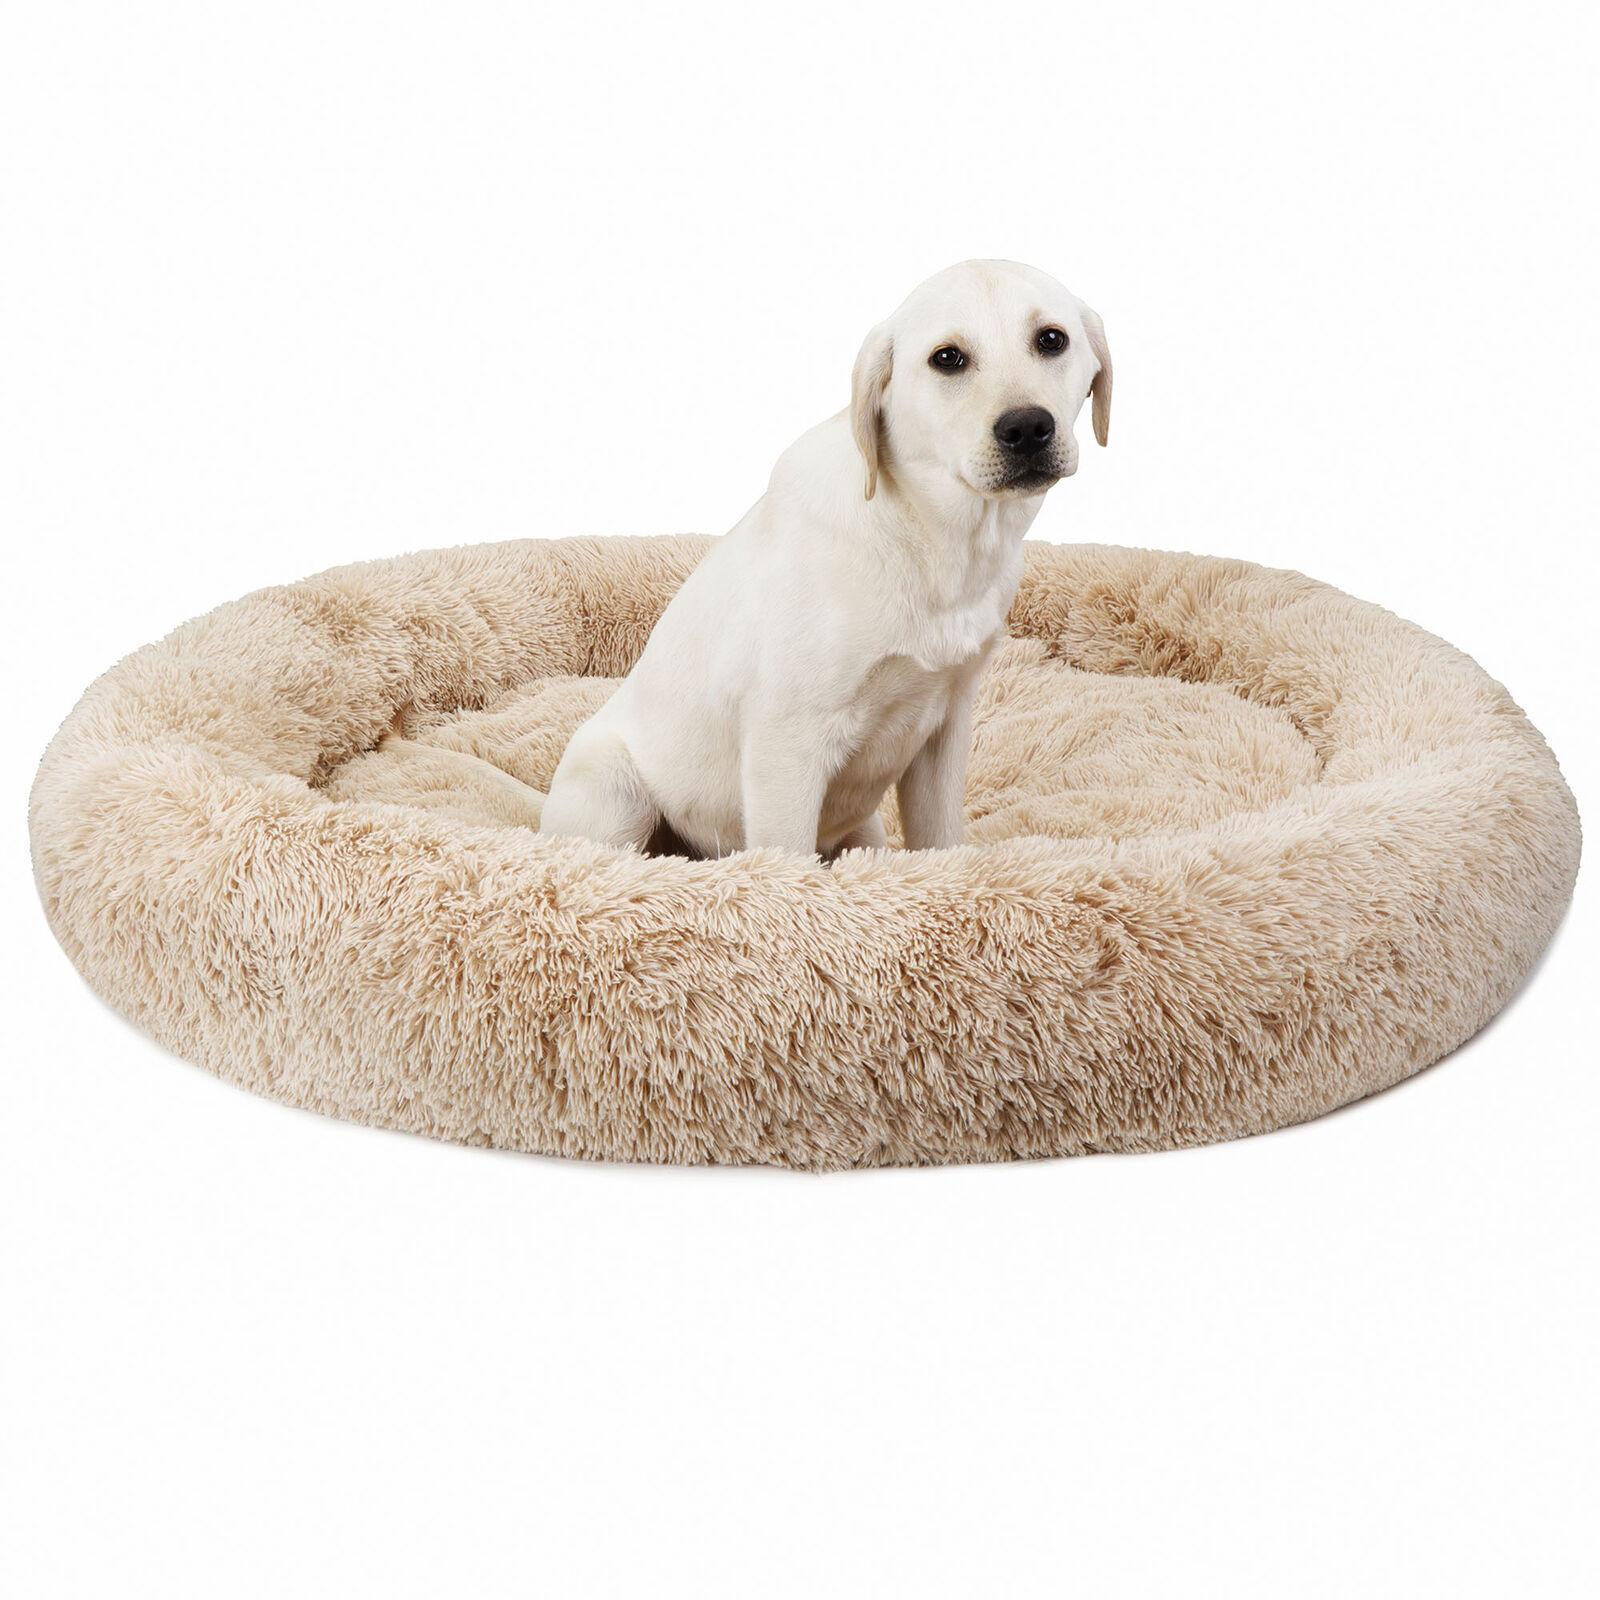 "Shaggy Fluffy 45""x45"" Pet Bed Dog Cat Donut Cuddler Cushion Mats Machine"